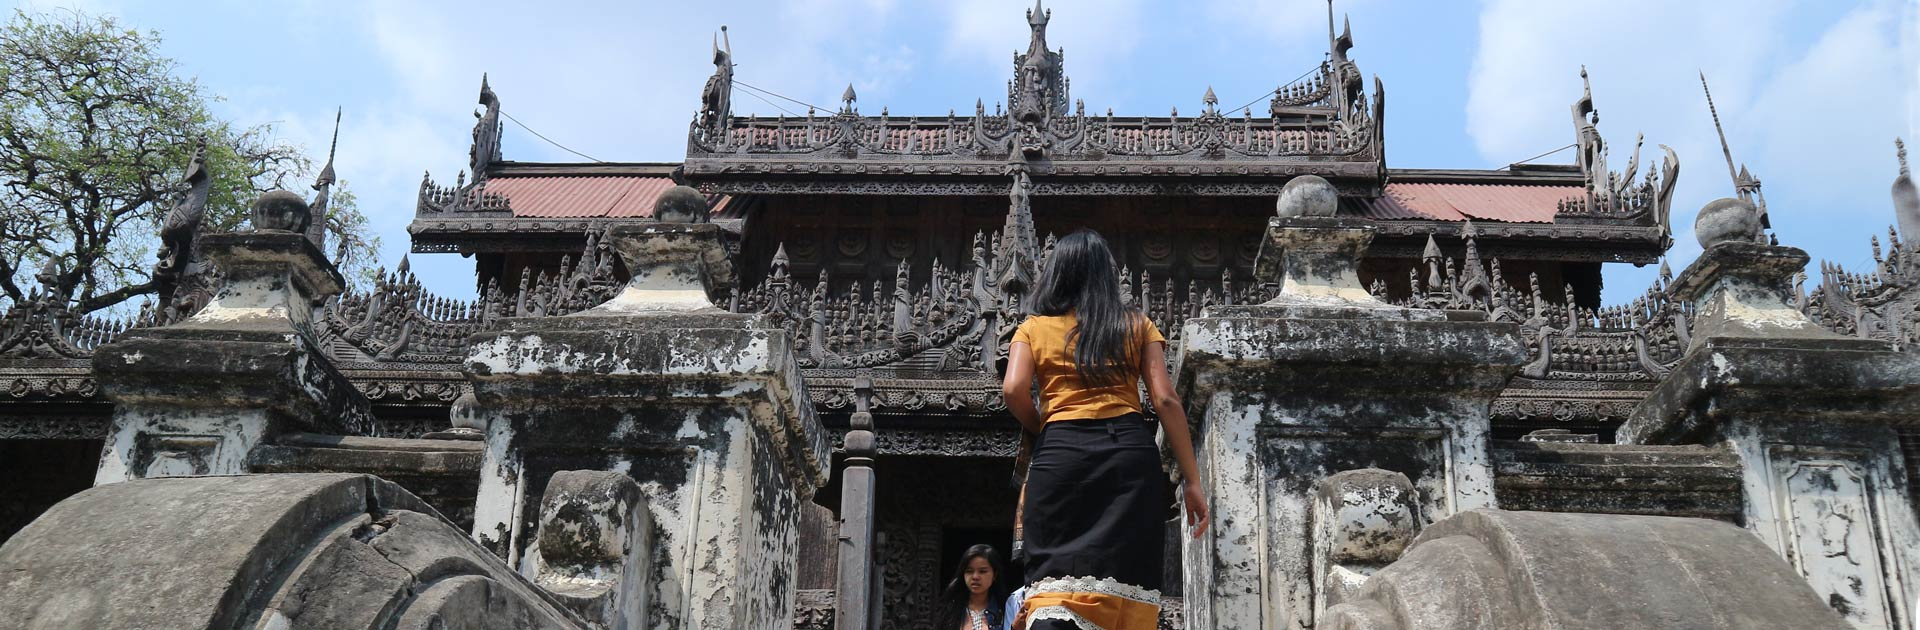 MM Myanmar Tierra Sagrada 17 días 2